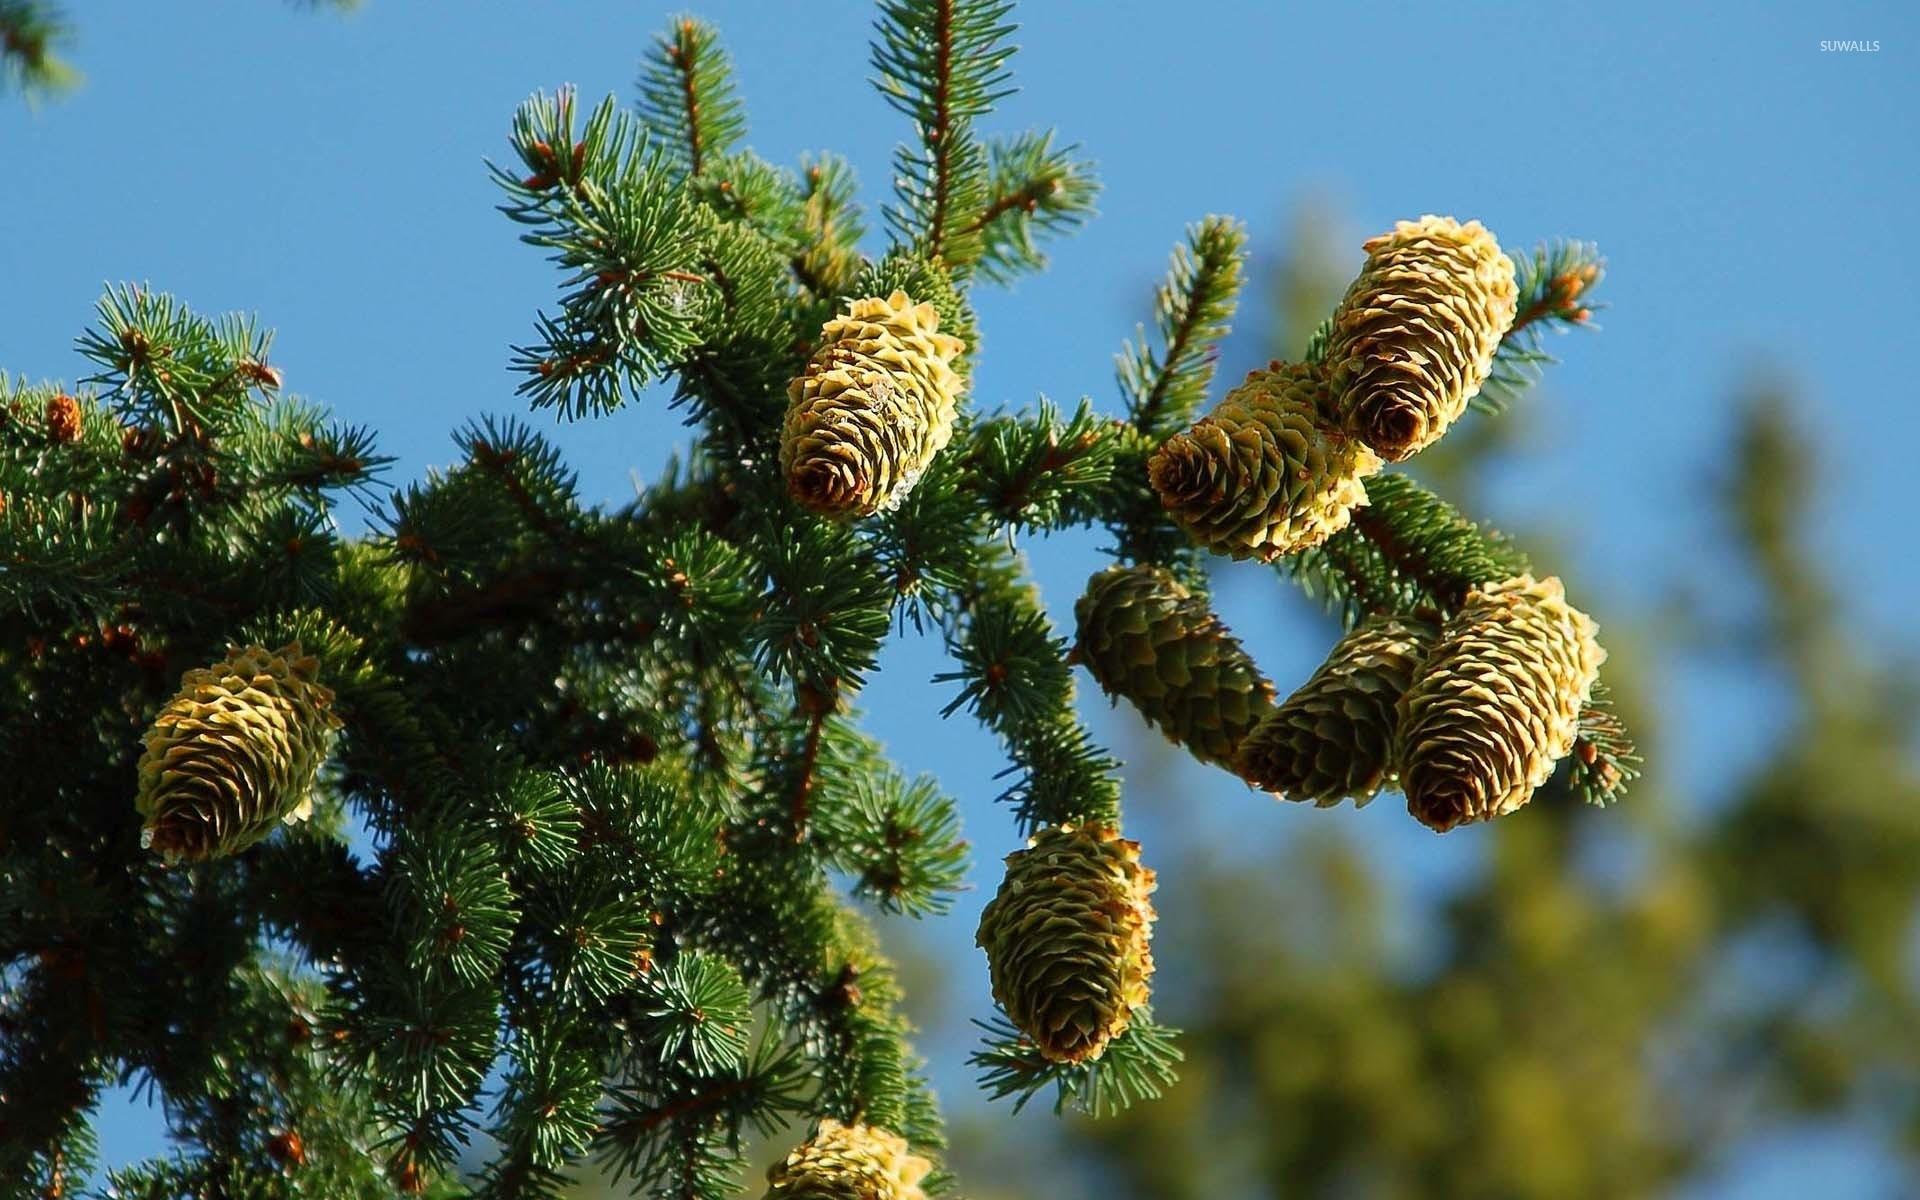 Res: 1920x1200, Cones in pine tree wallpaper